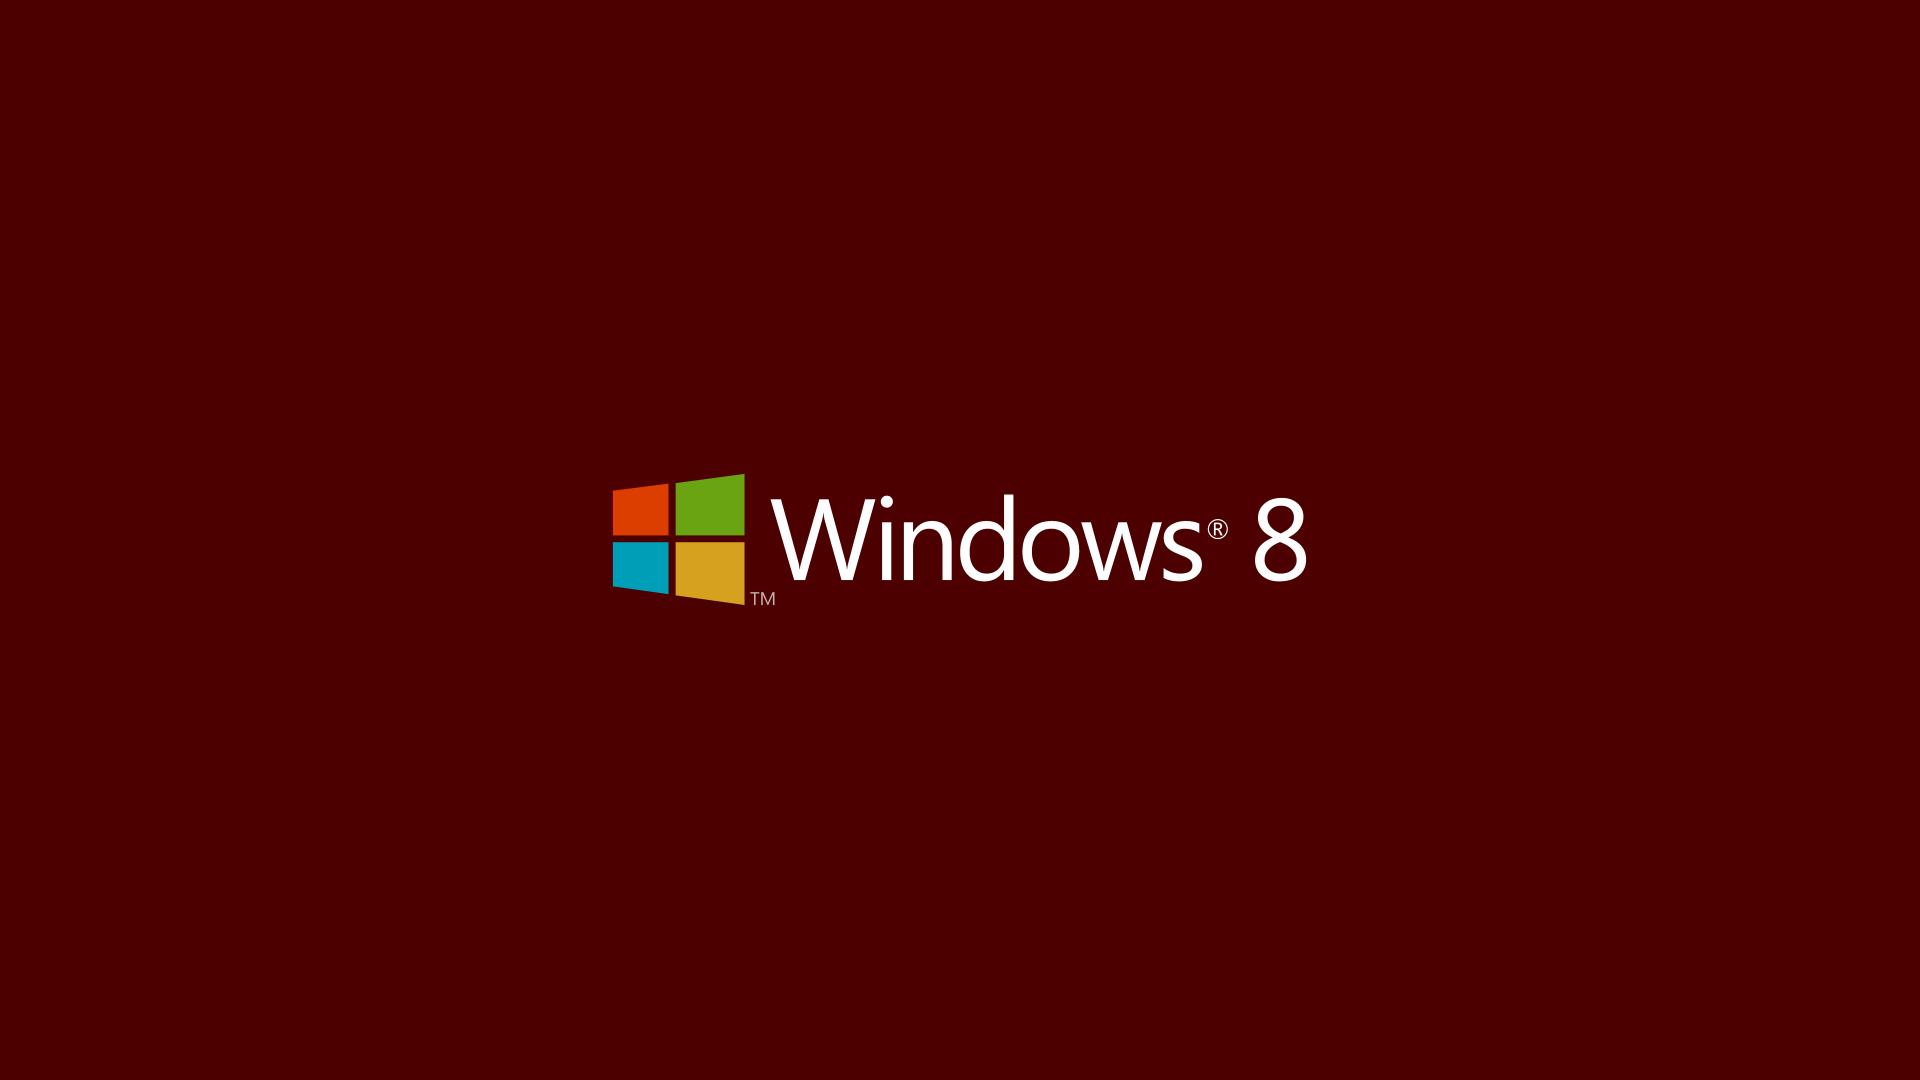 Microsoft Windows Wallpaper 1920x1080 Microsoft Windows 8 1920x1080